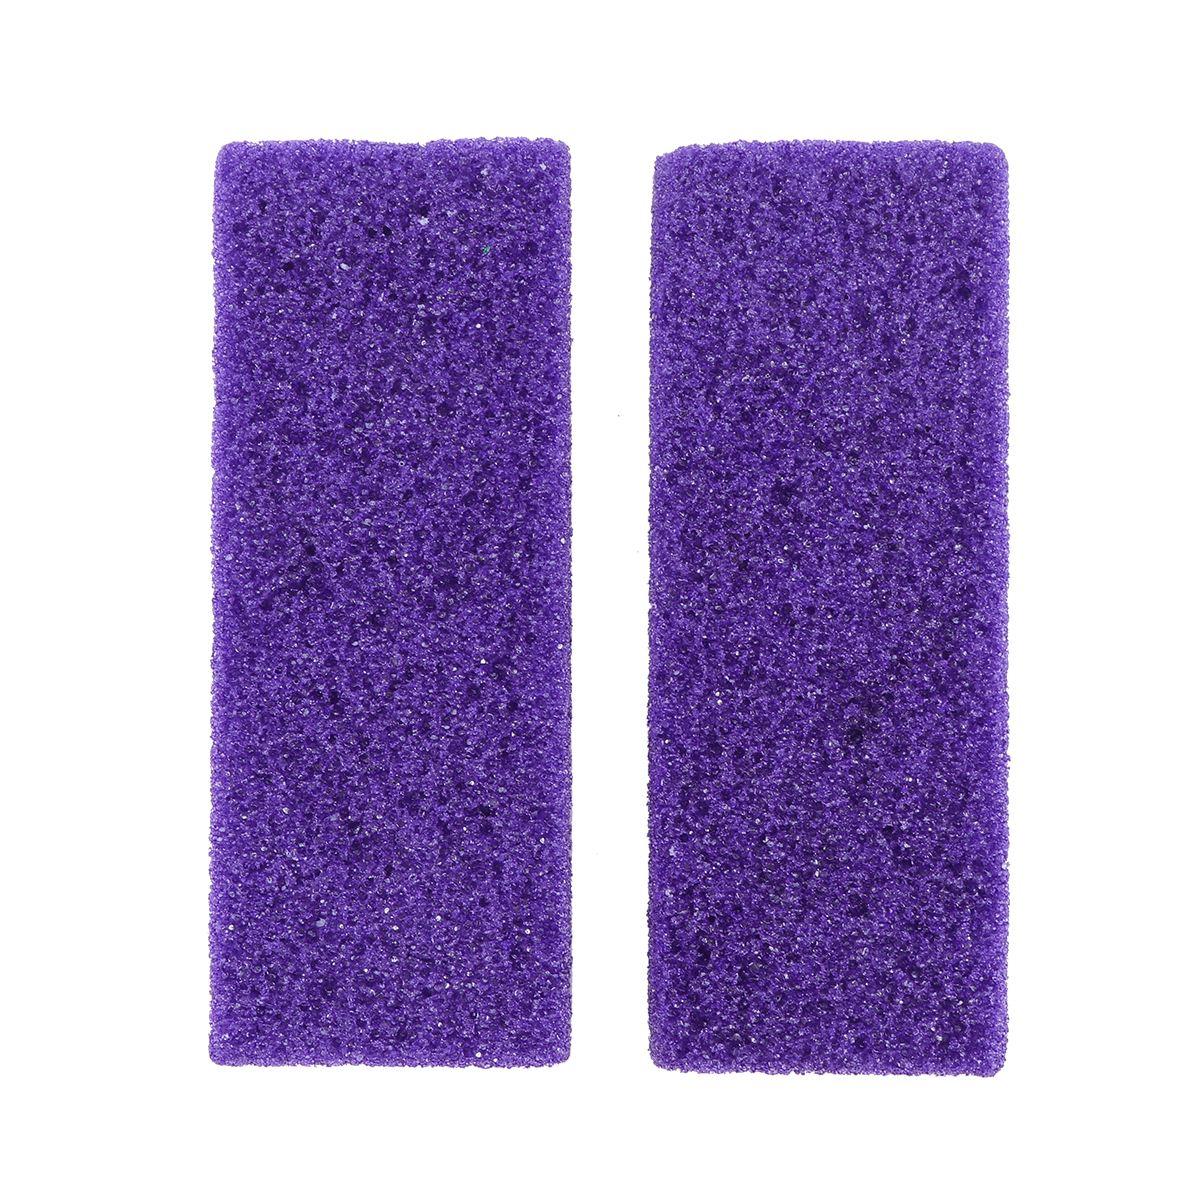 2pcs Foot Care Exfoliator Pedicure Tool Foot Pumice Stone Block Callus Remover Scrubber Dead Hard Skin Remover Cleaner A35